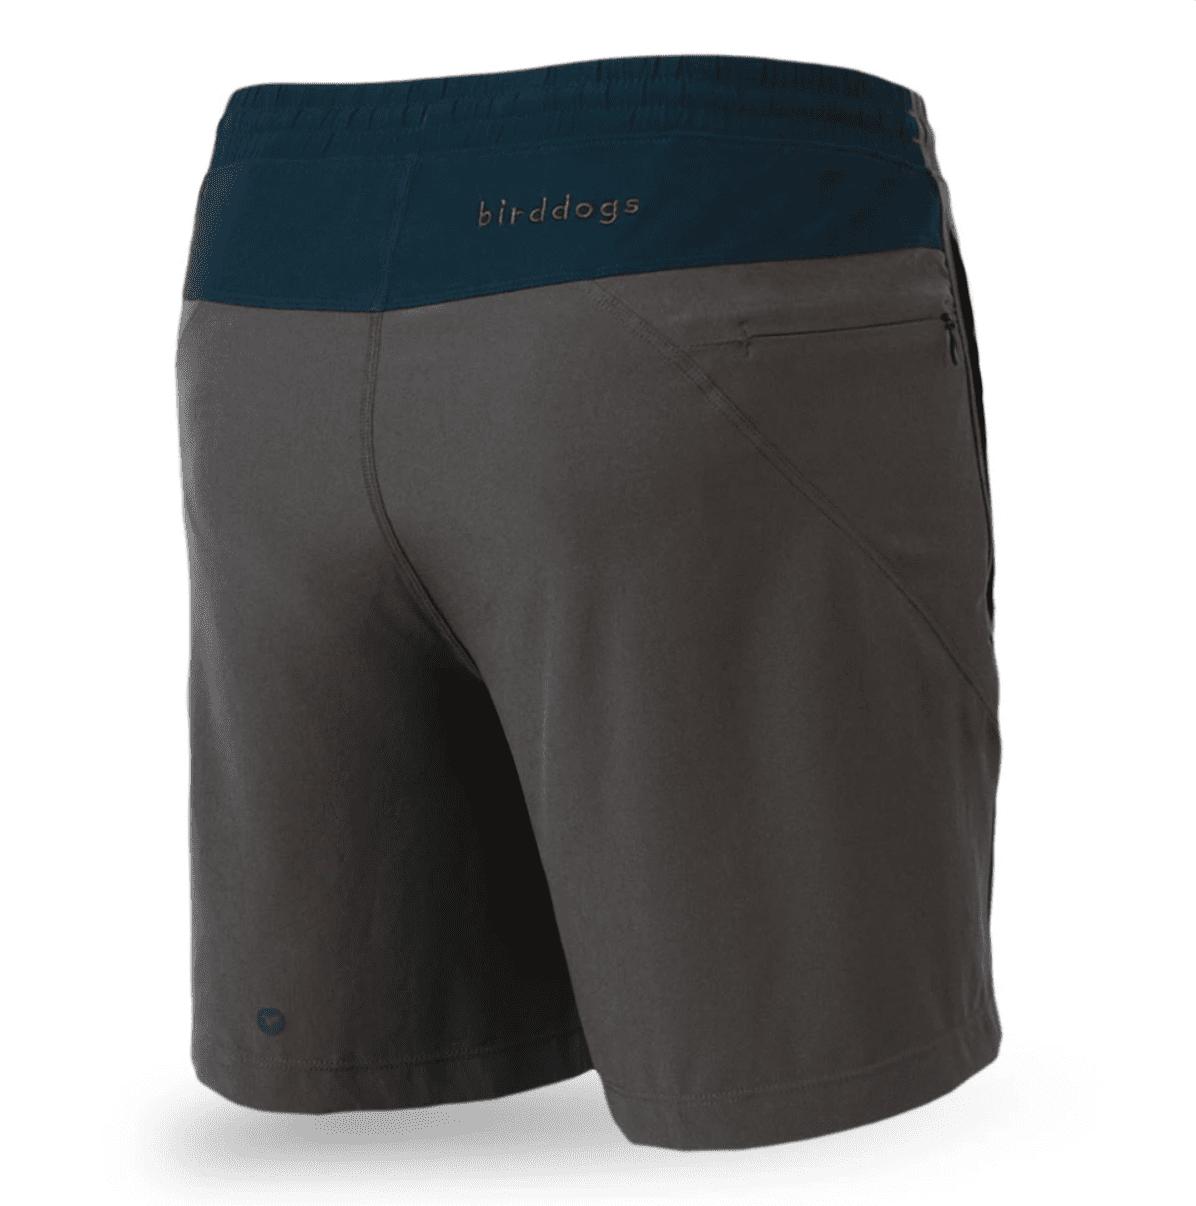 Birddogs Ironsides Shorts